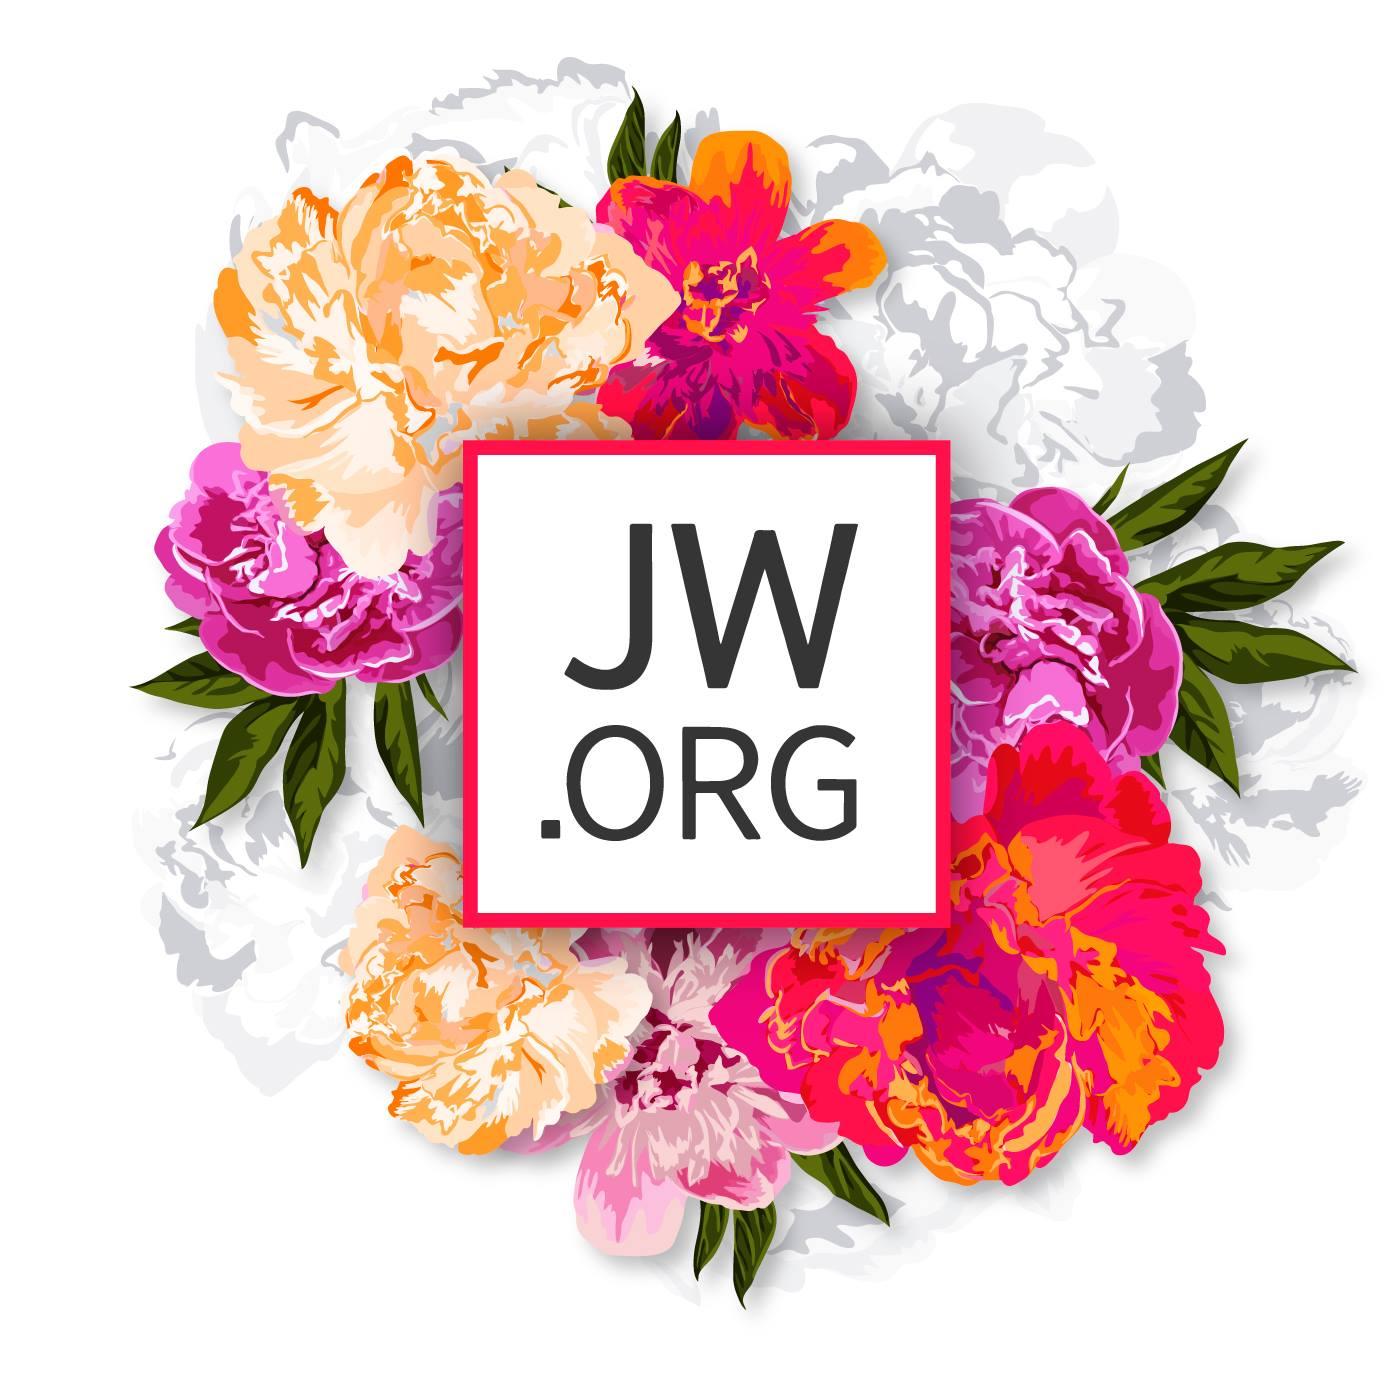 Jehovahs Witnesses Jw Logo   1400x1400 Wallpaper   teahubio 1400x1400